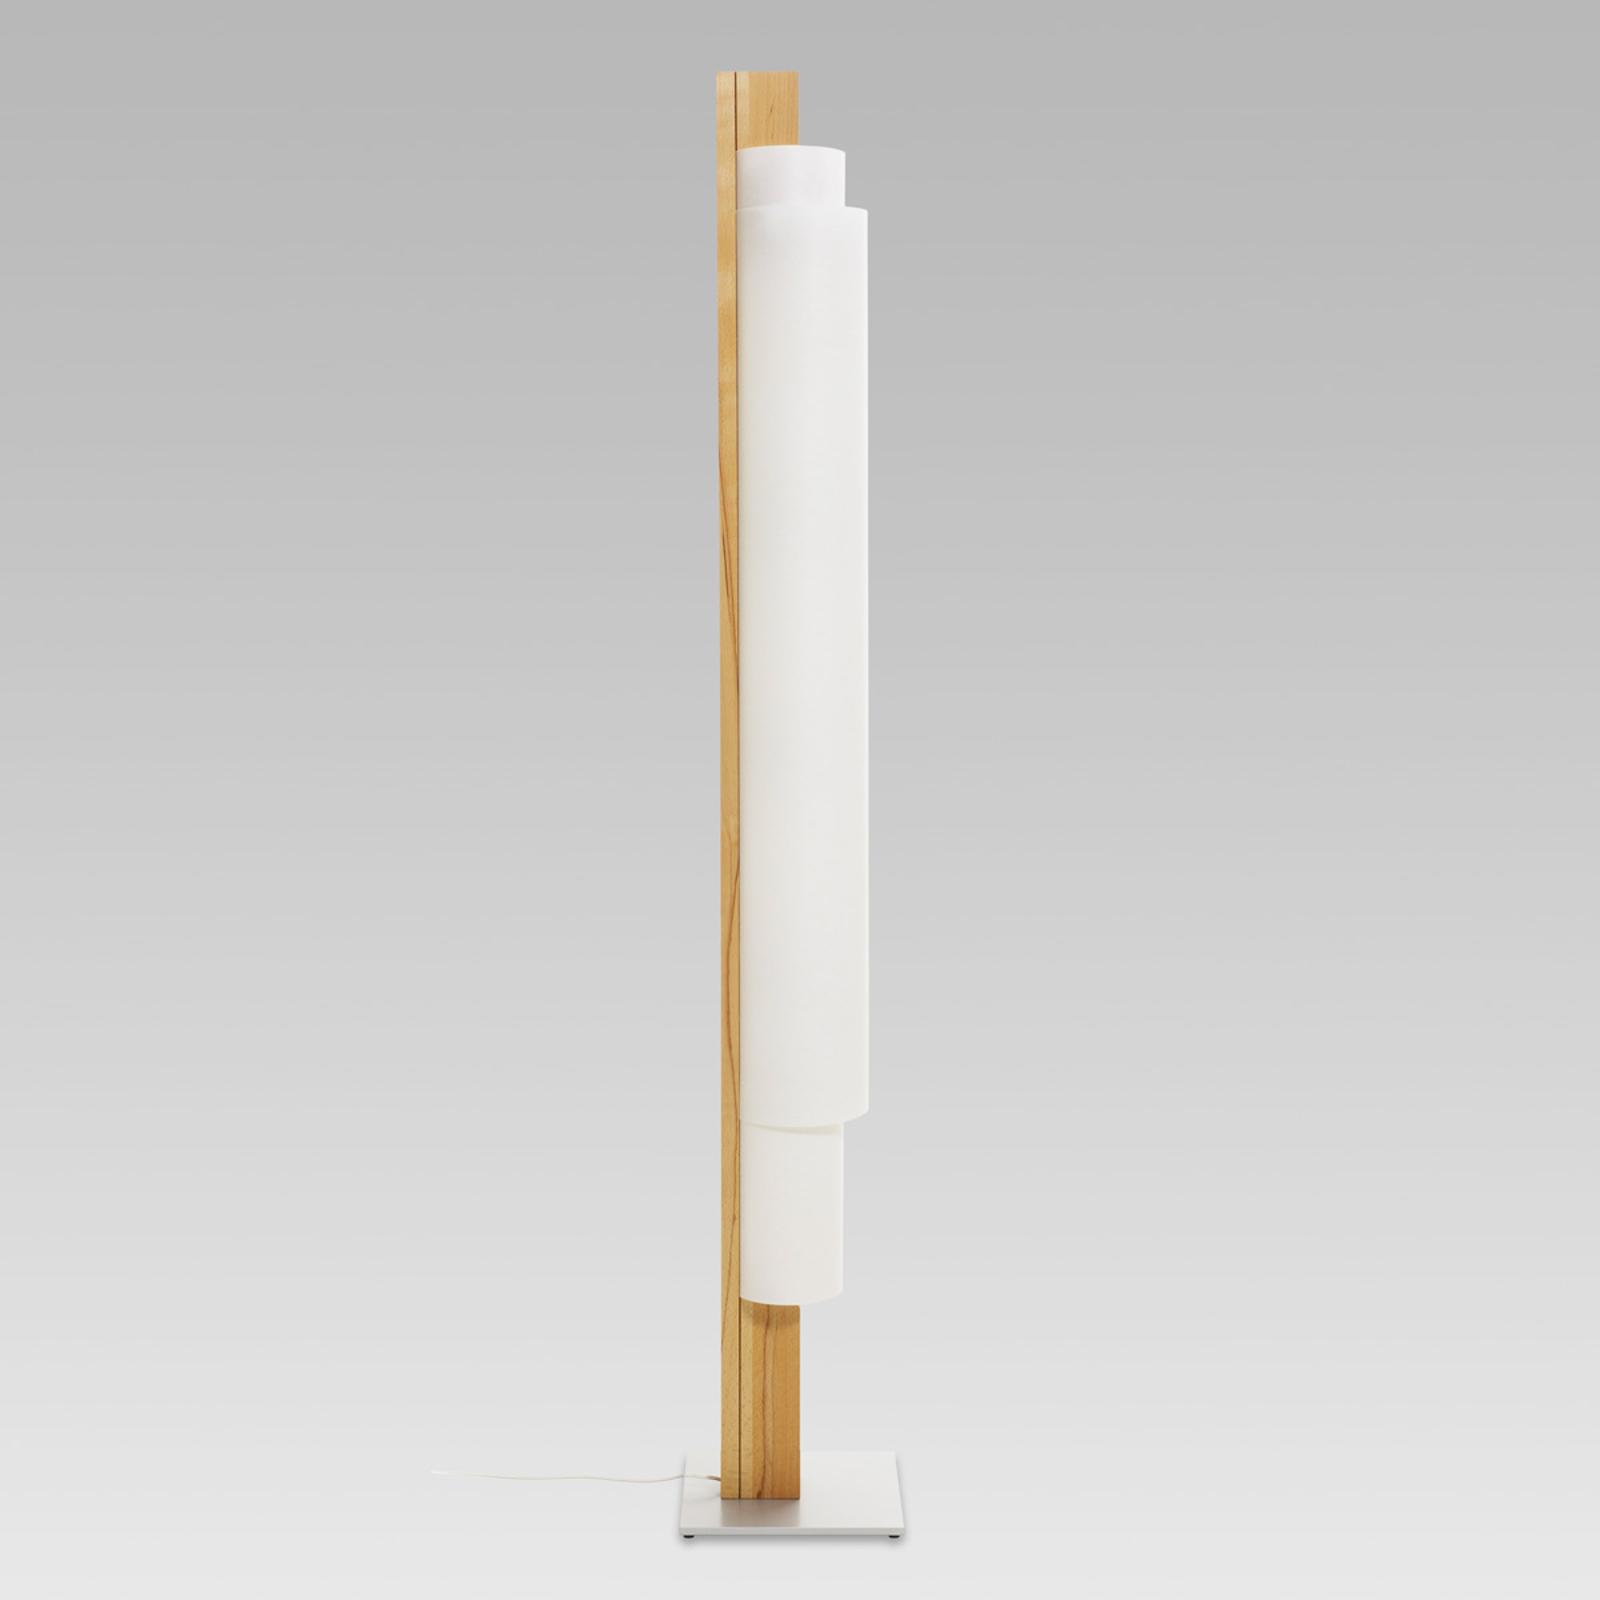 Stele LED floor lamp in beech heartwood_2600502_1